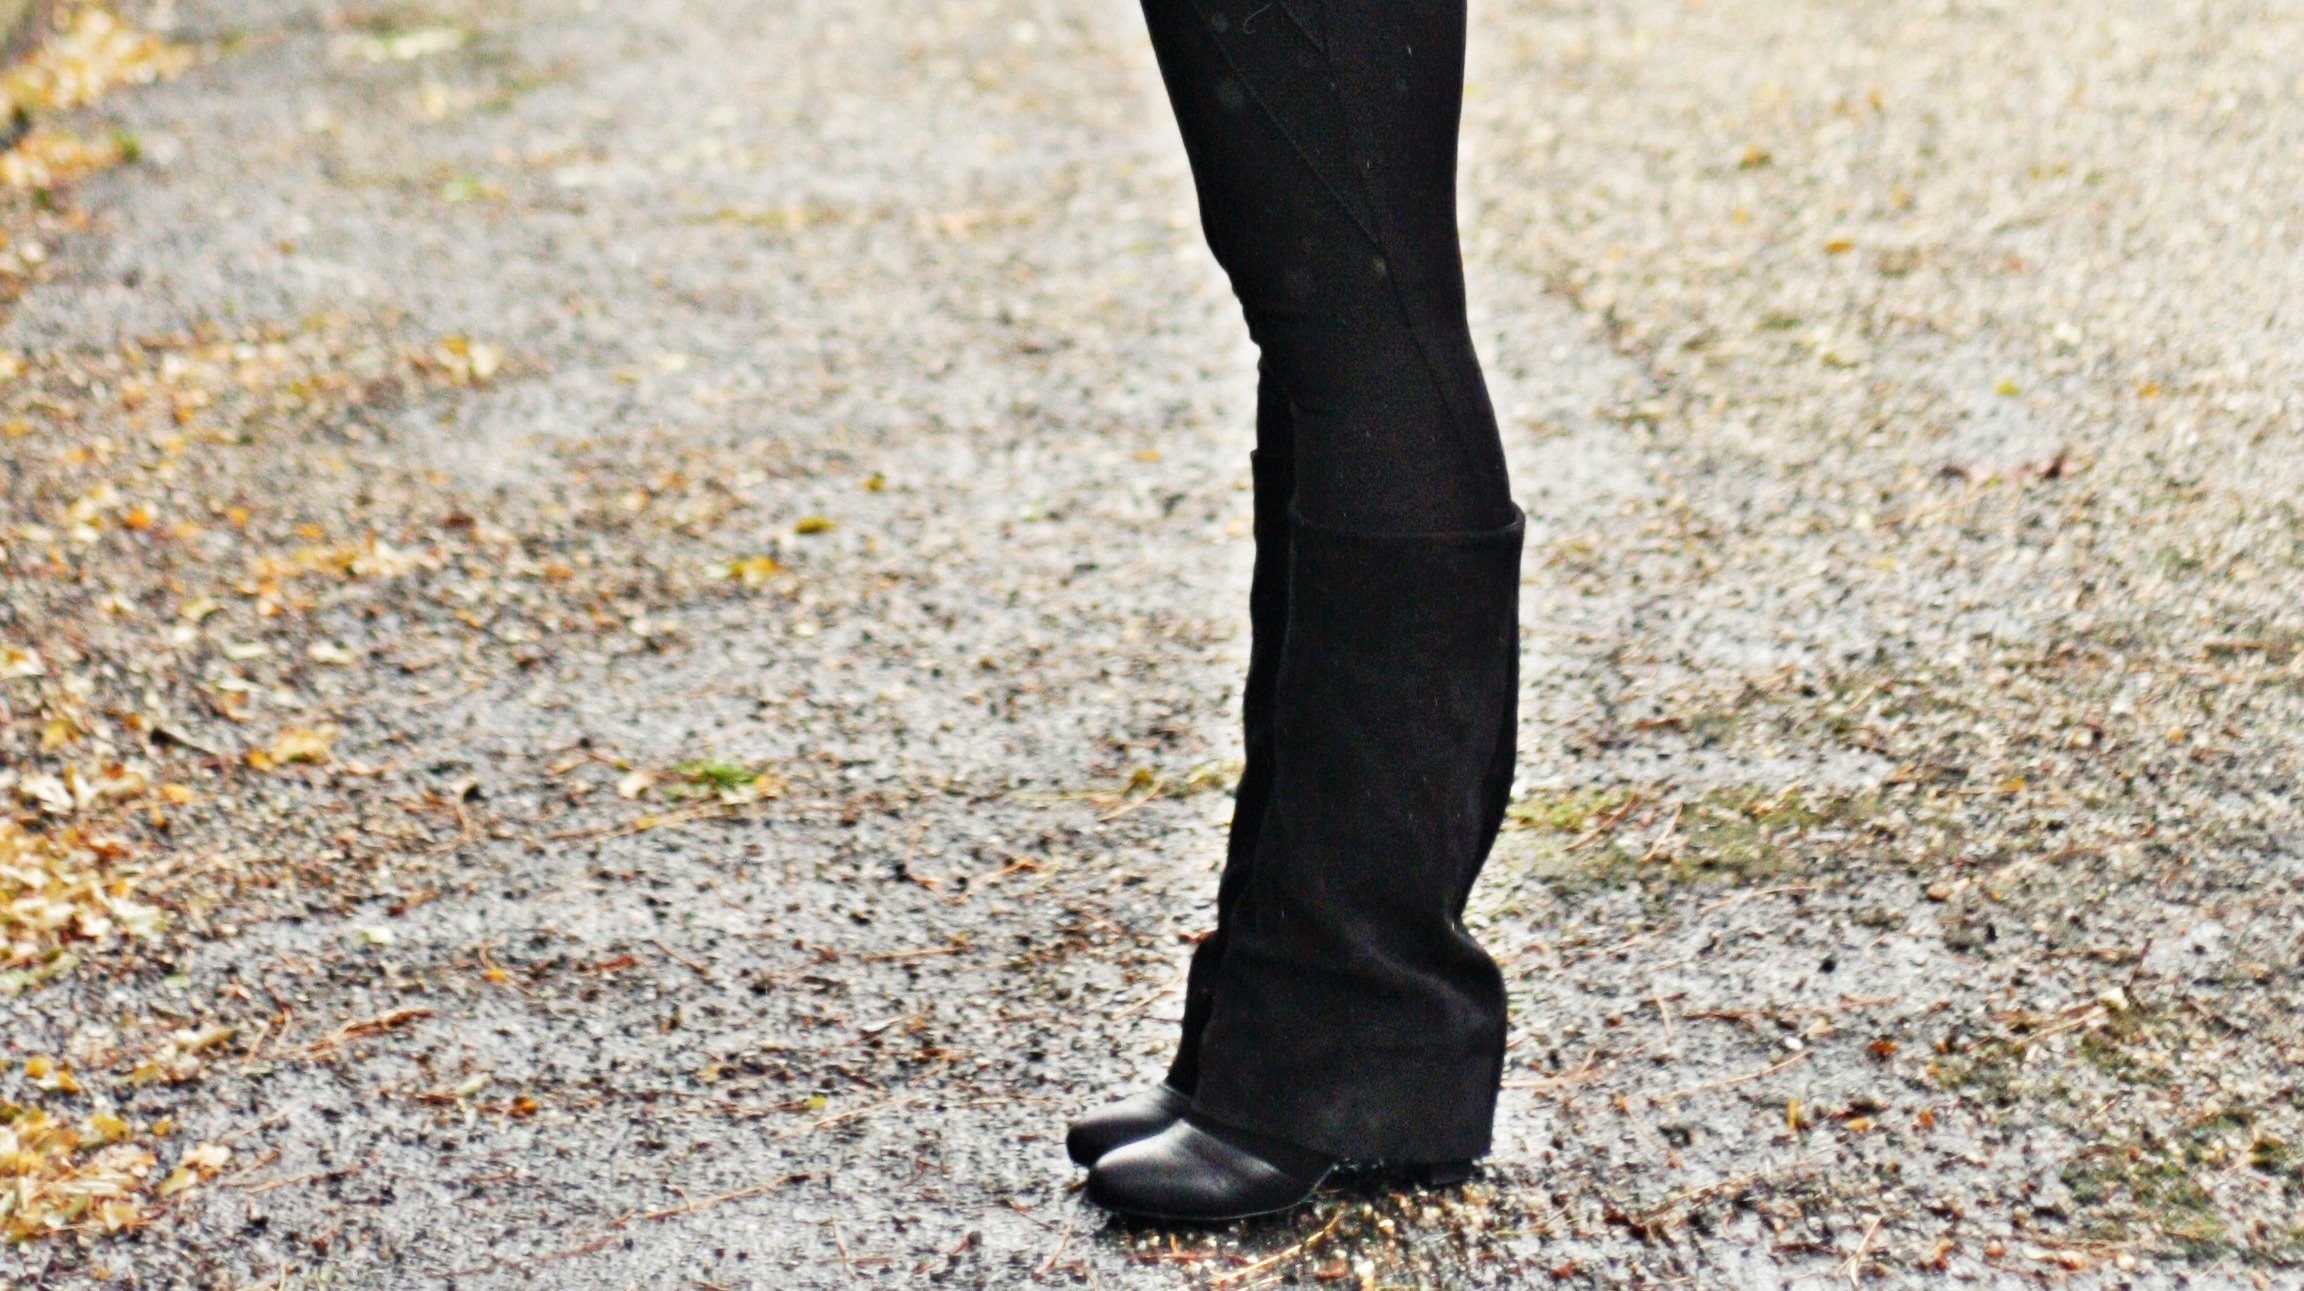 bottes-see-by-chloé-bottes-a-revers-blog-mode-aurelia-pull-wallis-wallis-mode-sac-chloé